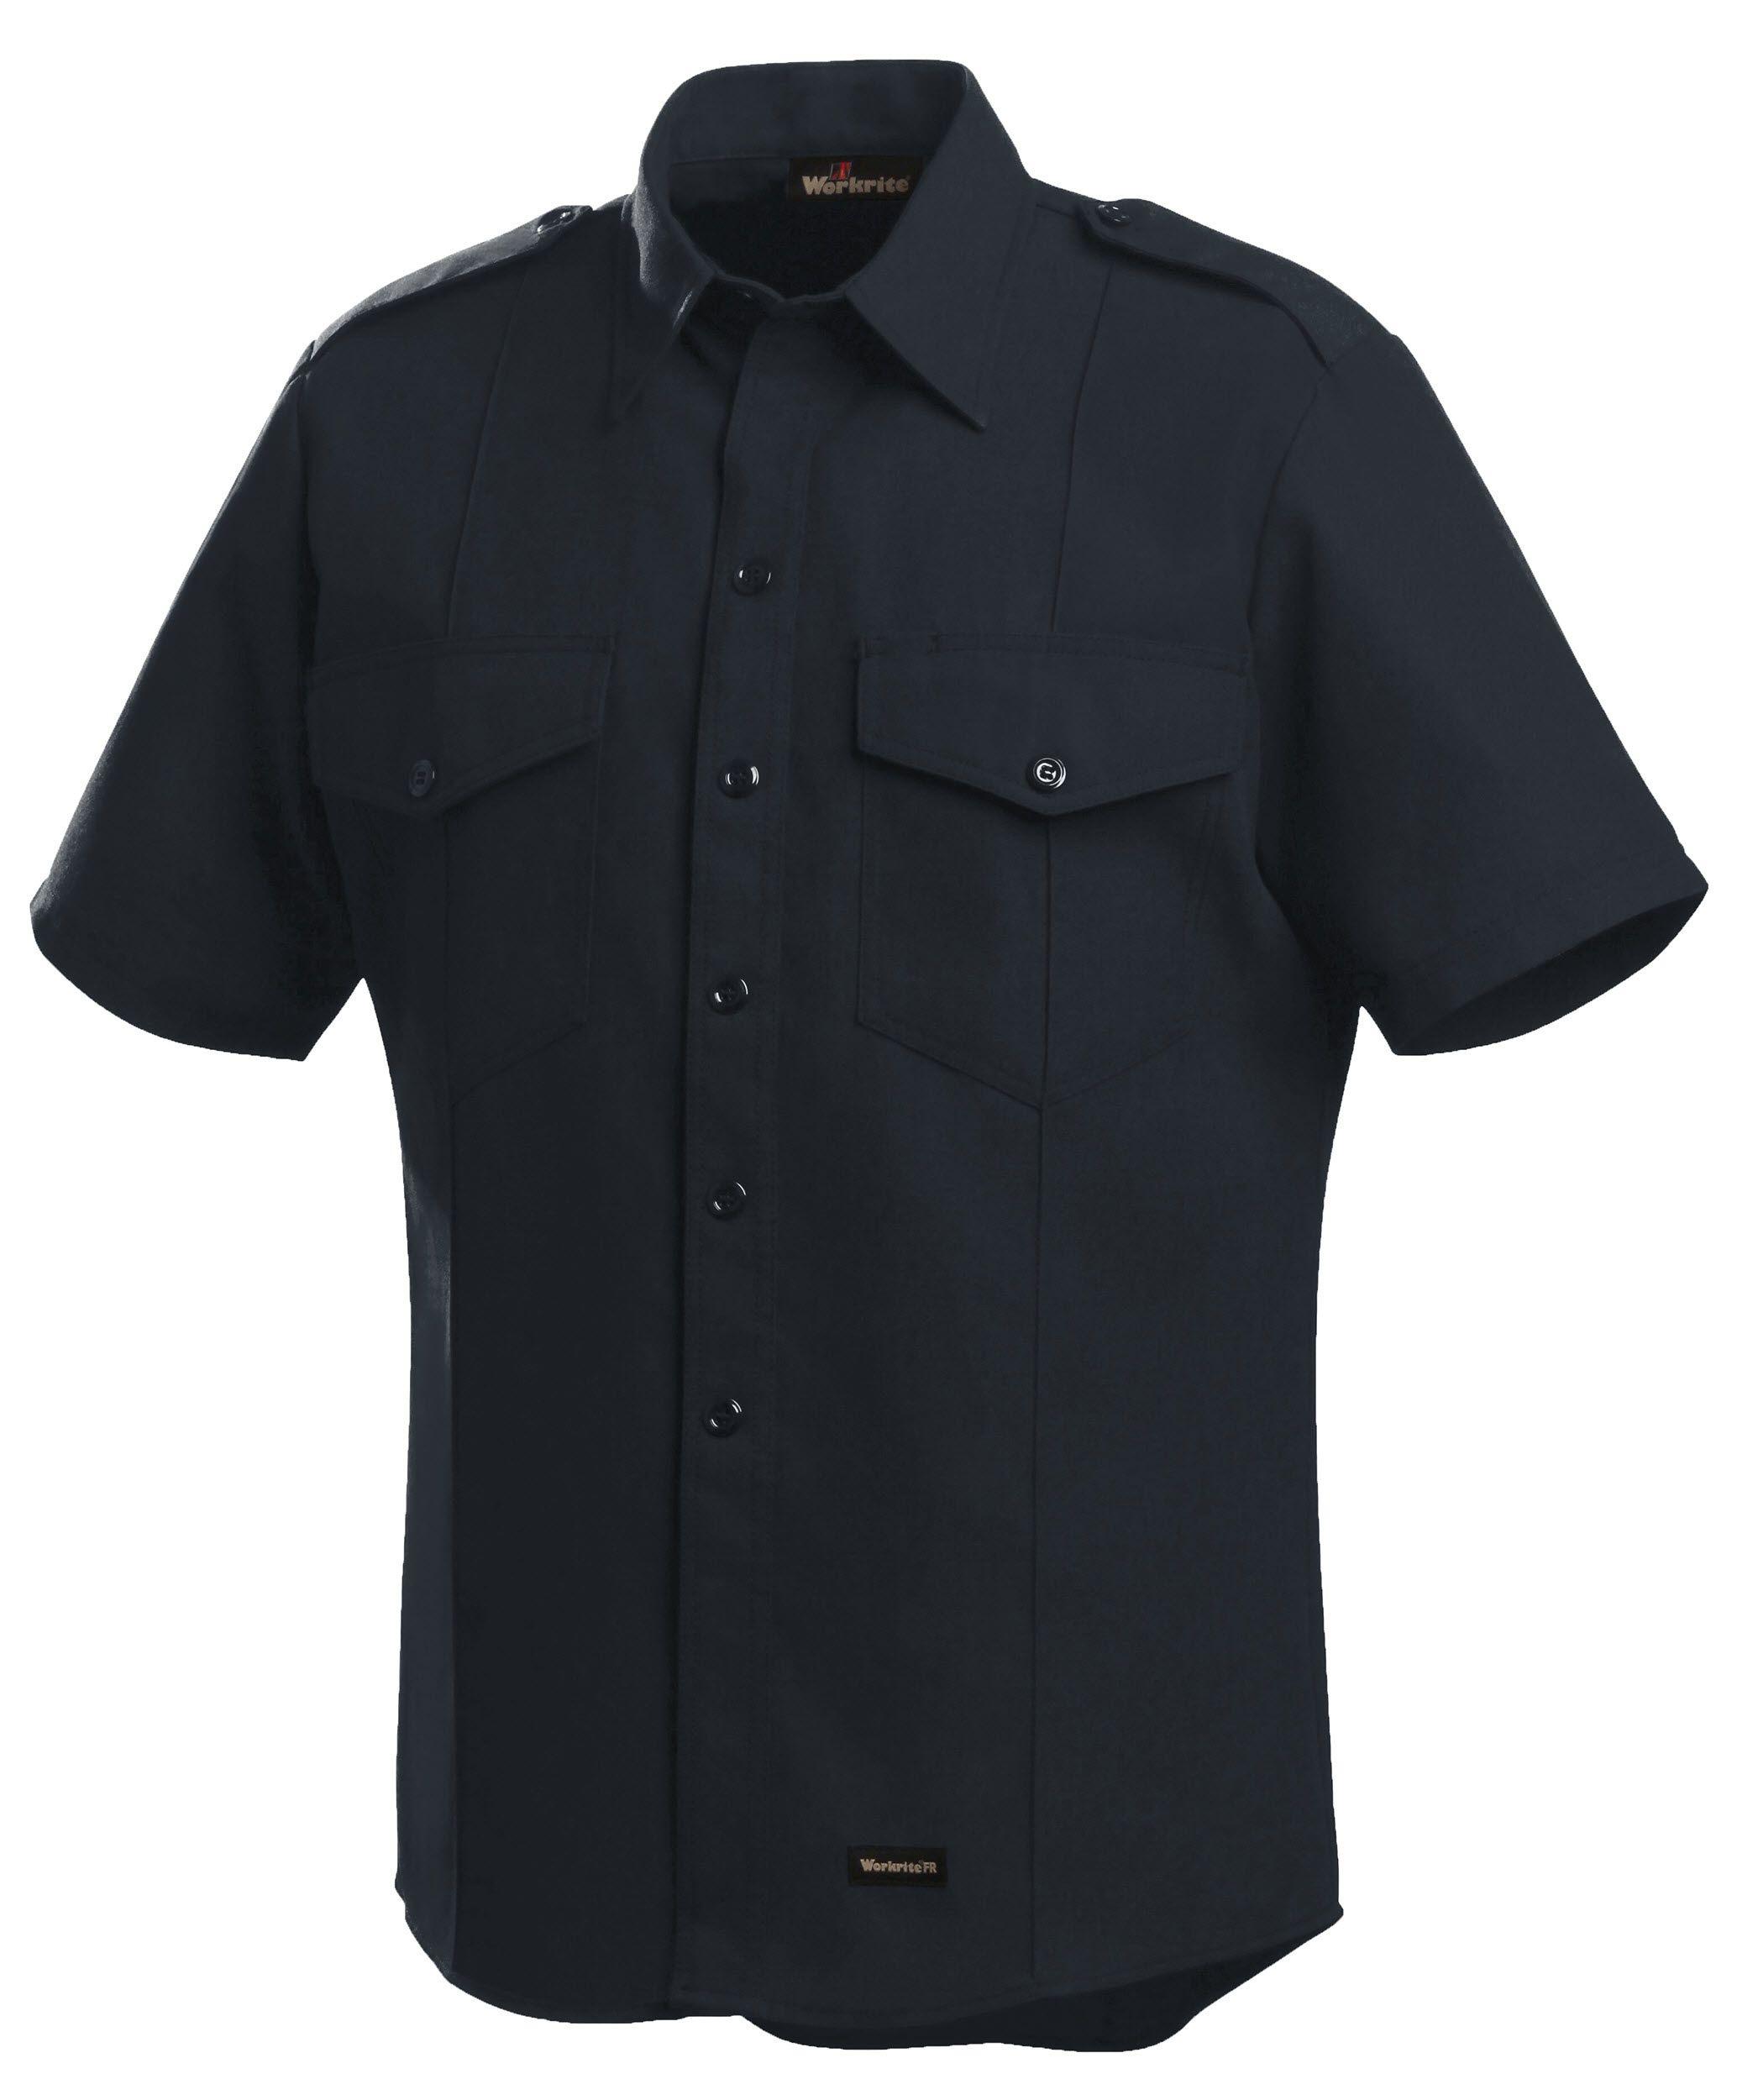 4.5 oz. Nomex IIIA Short-Sleeve Fire Chief Shirts With Working Epaule-